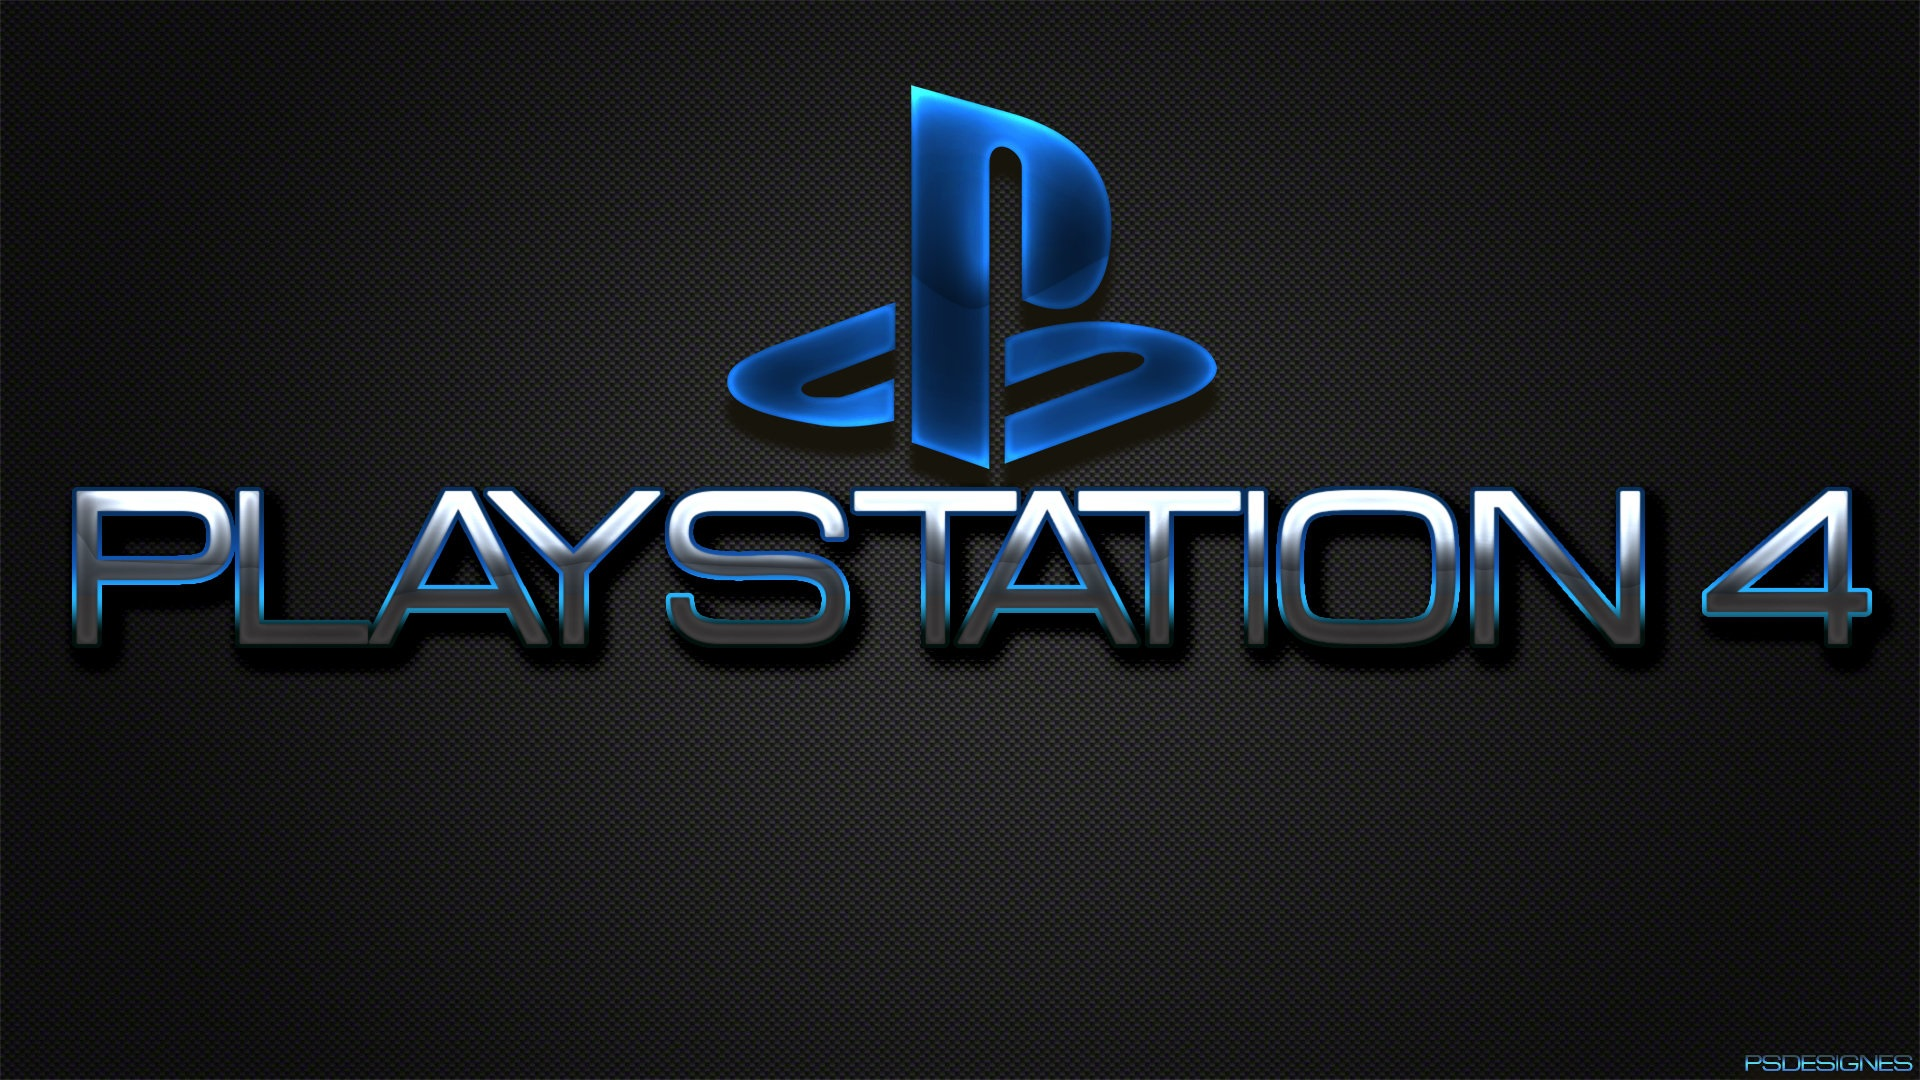 Playstation 4 logo, Sony Wallpaper | 1920x1080 Full HD ...